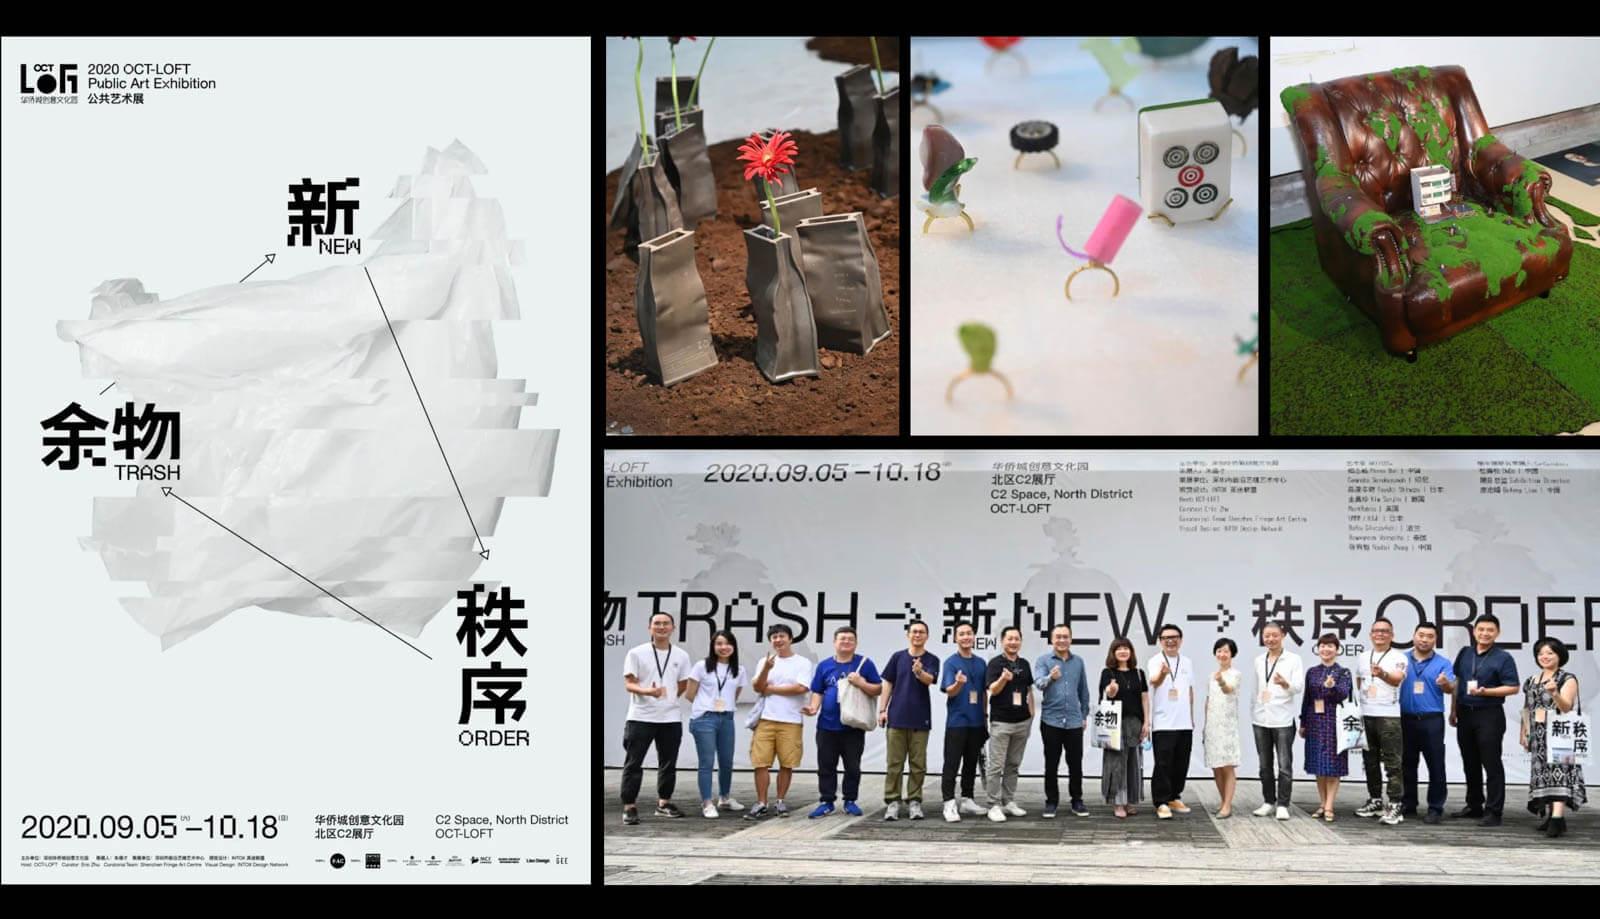 【OCT-LOFT】2020 Public Art Exhibition「余物新秩序 Trash New Order」開催中!(9/5-10/18)